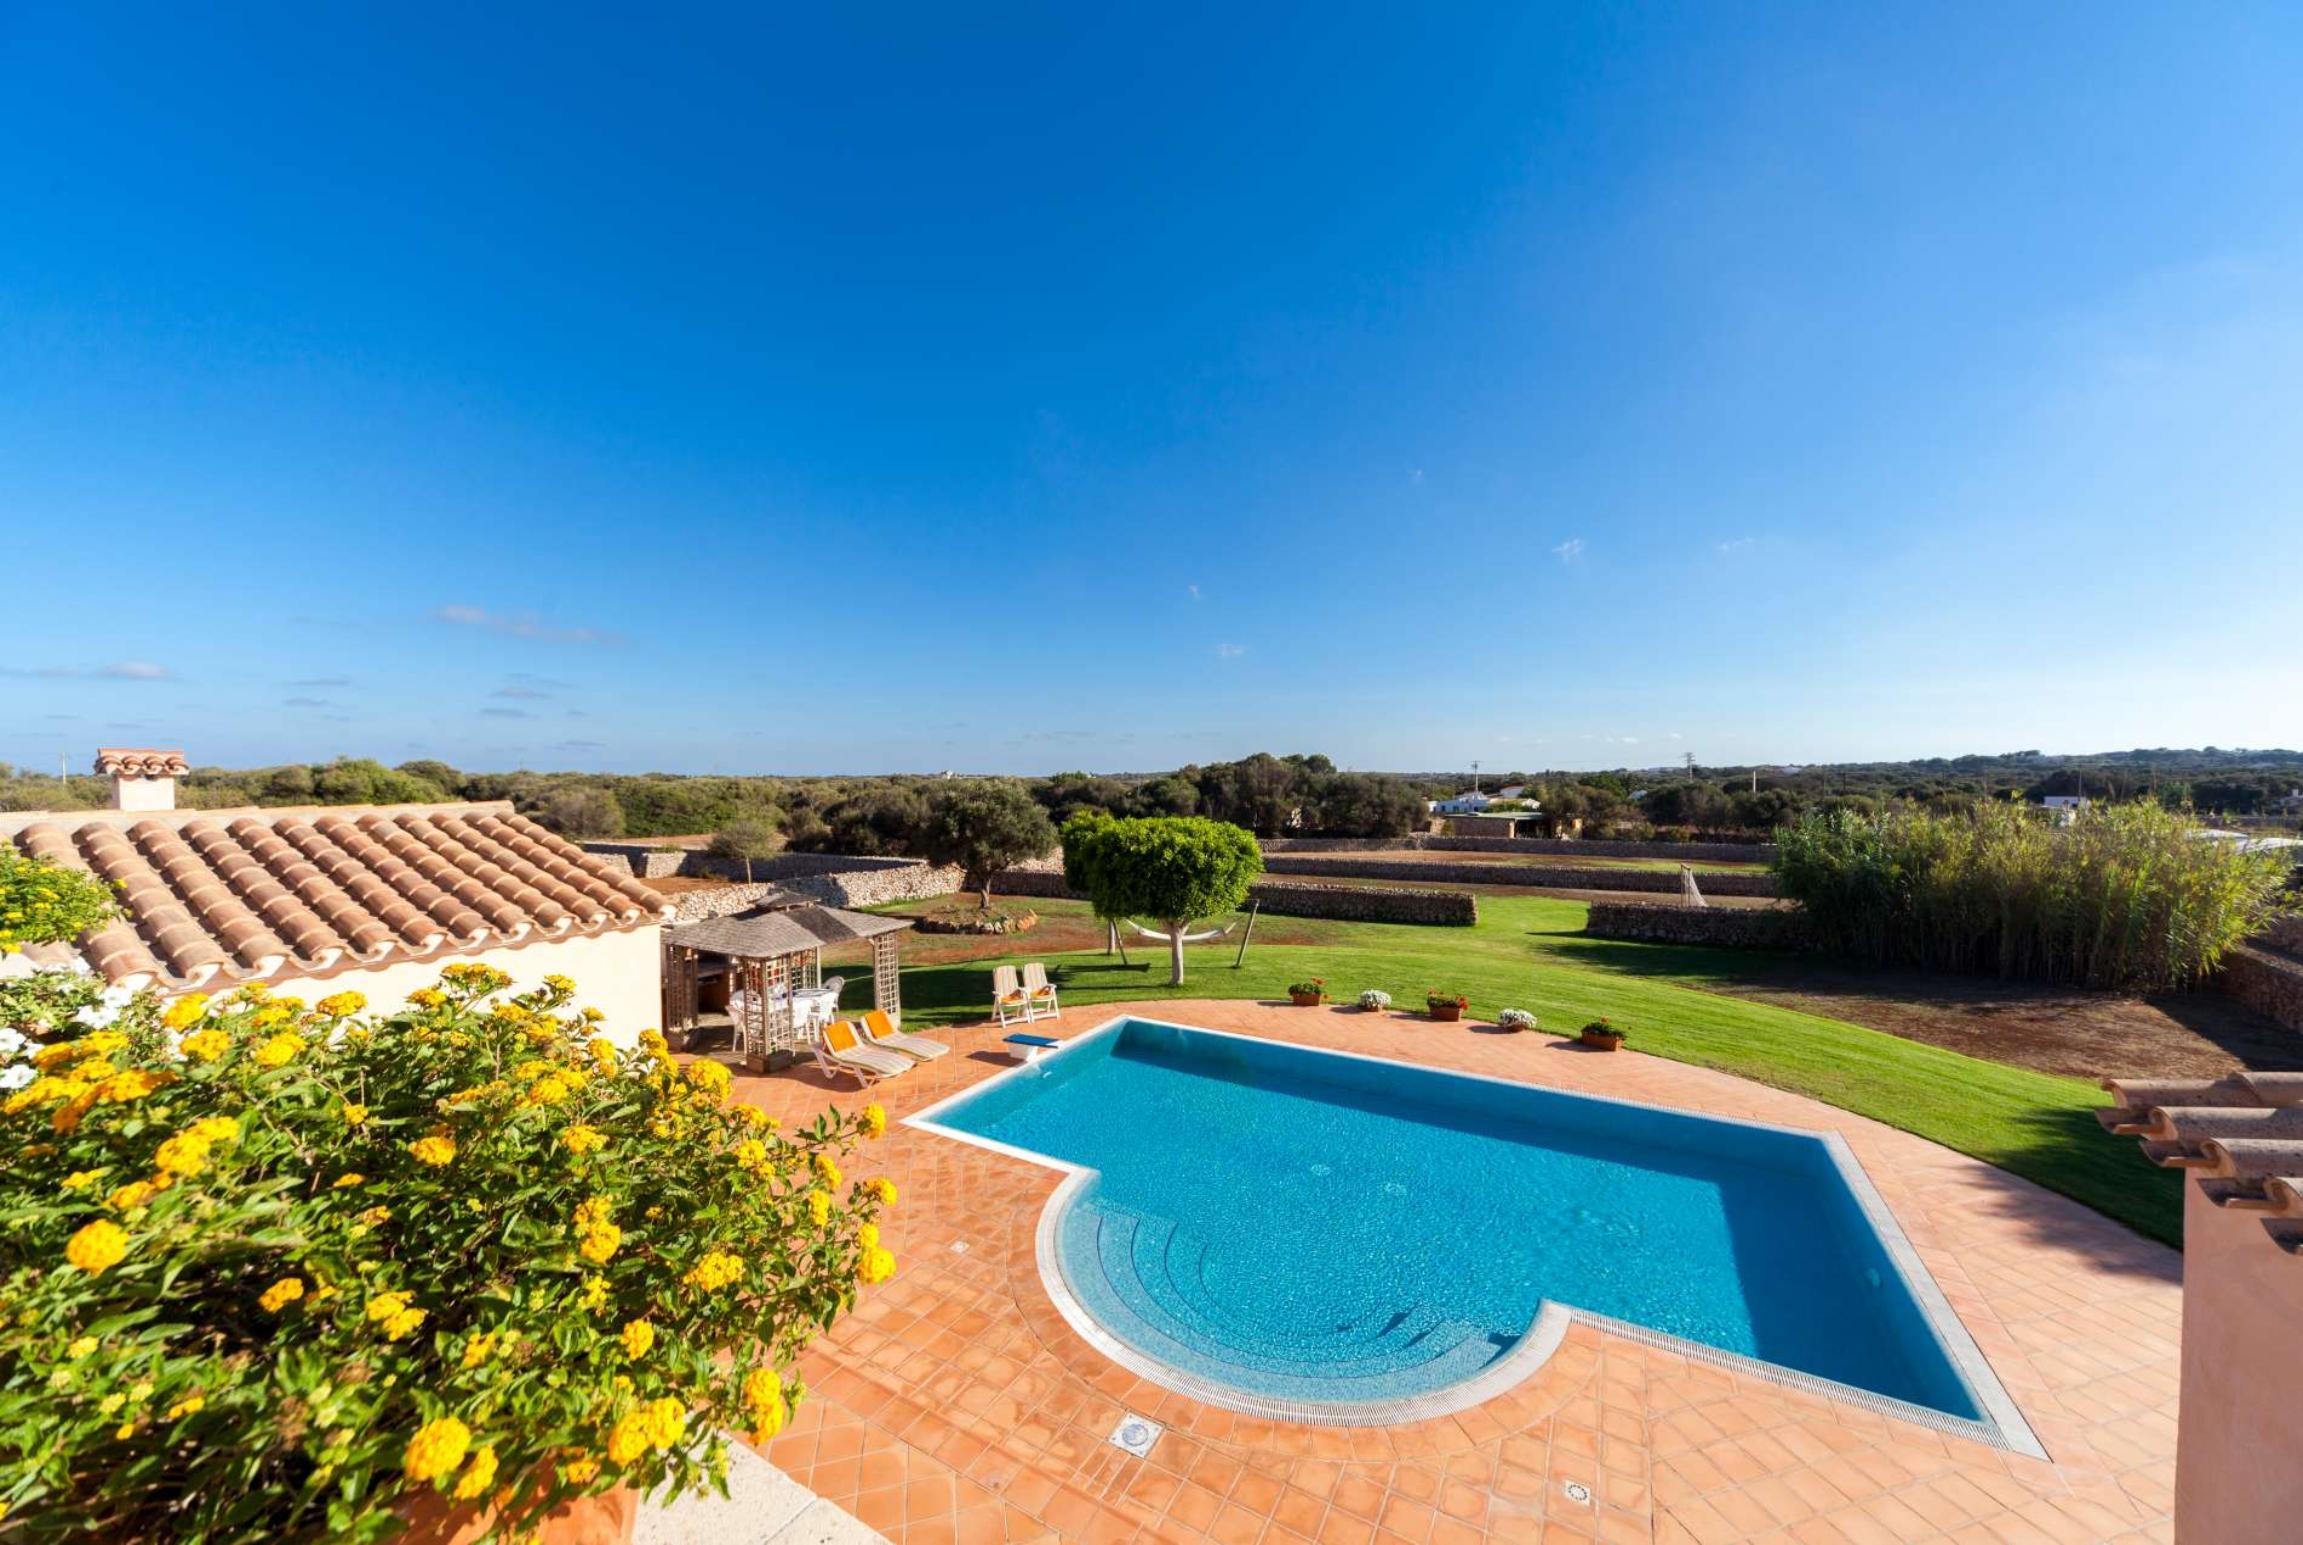 Ferienhaus Villa Estrellita (2649653), Punta Prima, Menorca, Balearische Inseln, Spanien, Bild 23